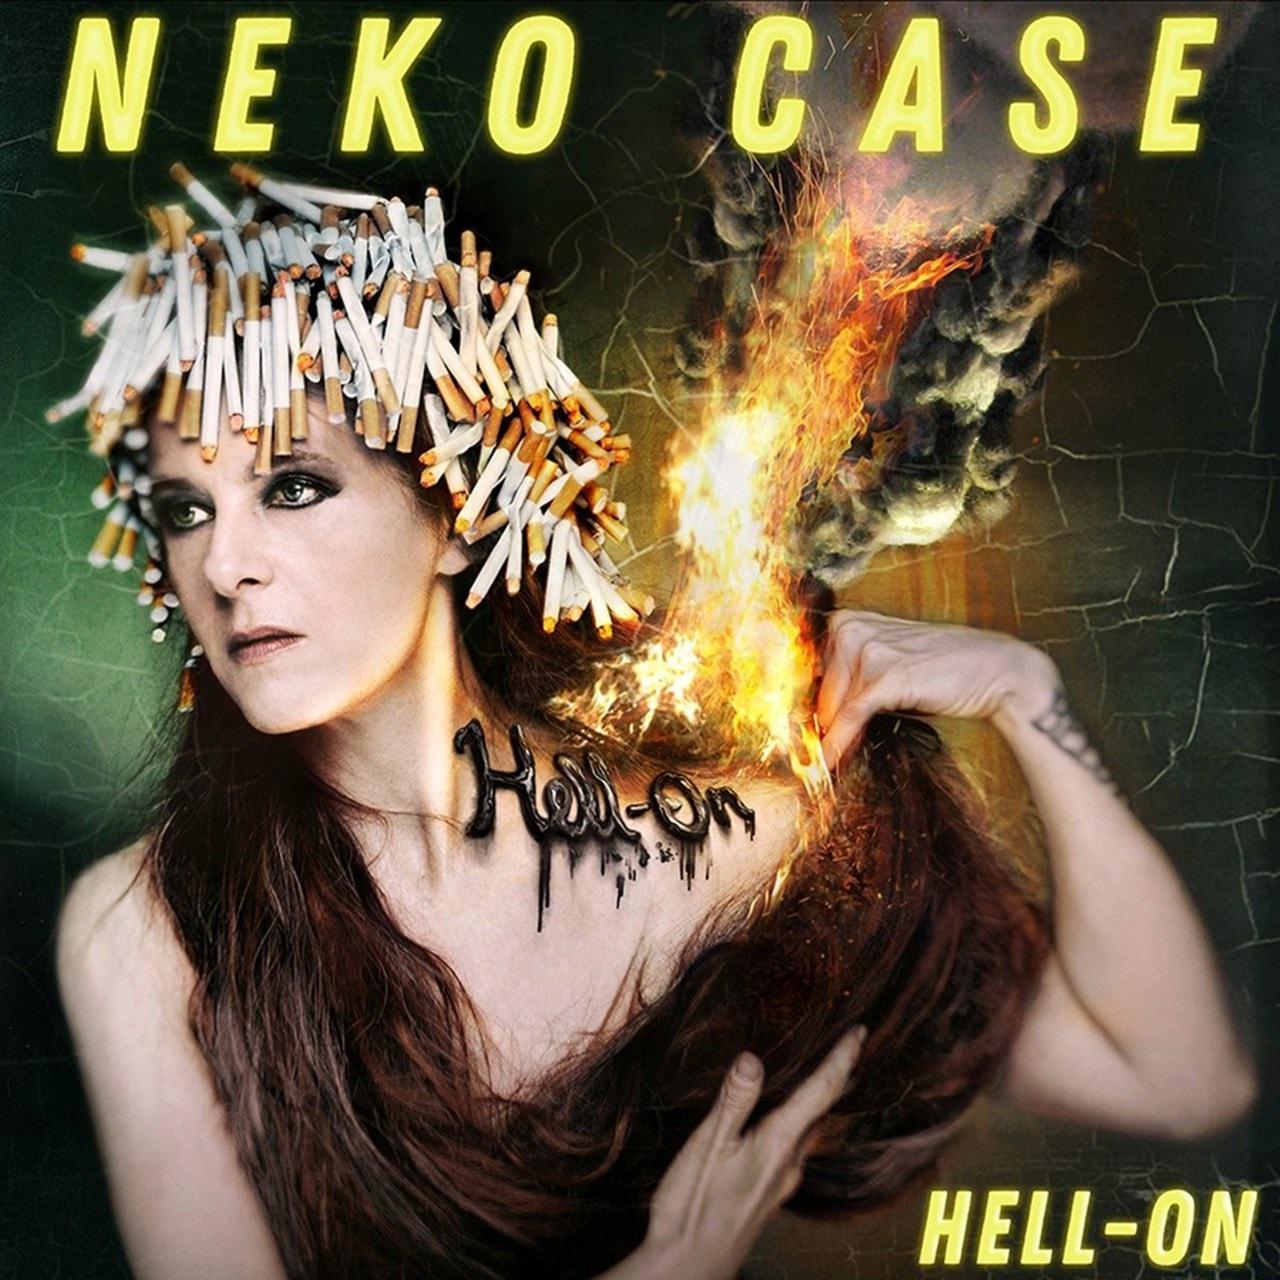 Hell-on - 1